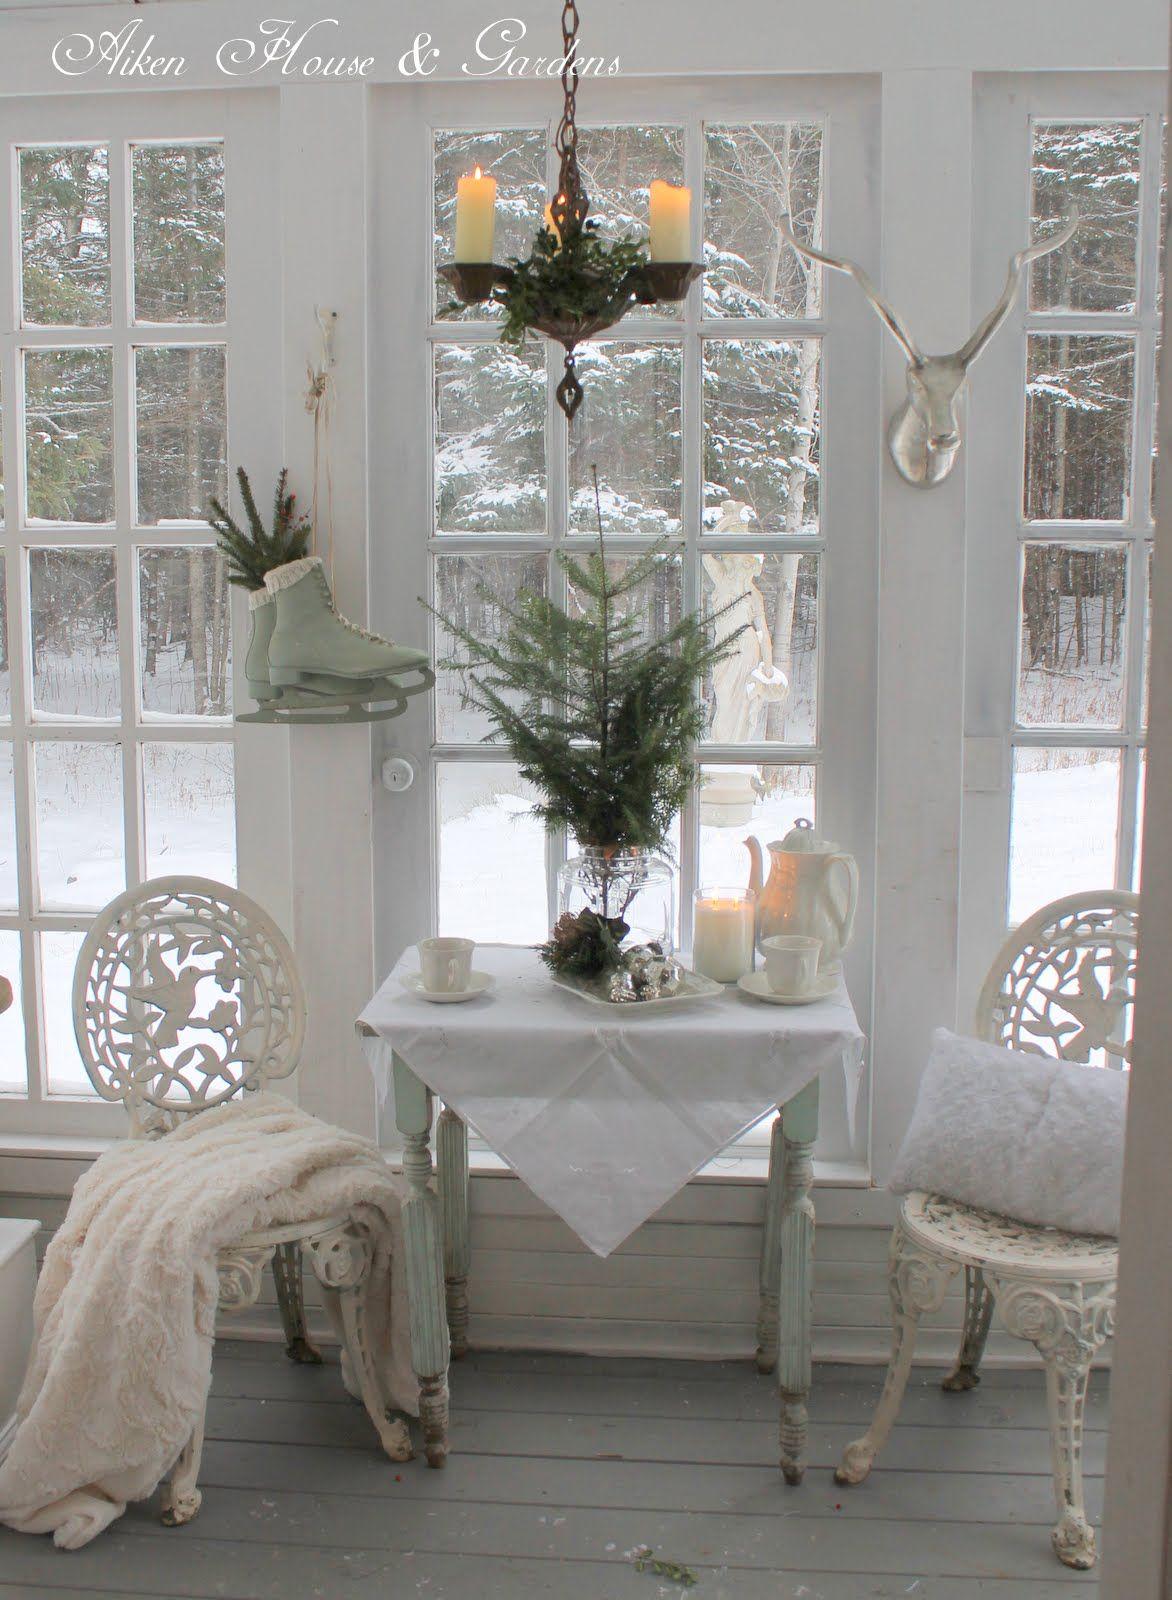 shabby chic home interior romantic pinterest shabby chic wohnzimmer und. Black Bedroom Furniture Sets. Home Design Ideas